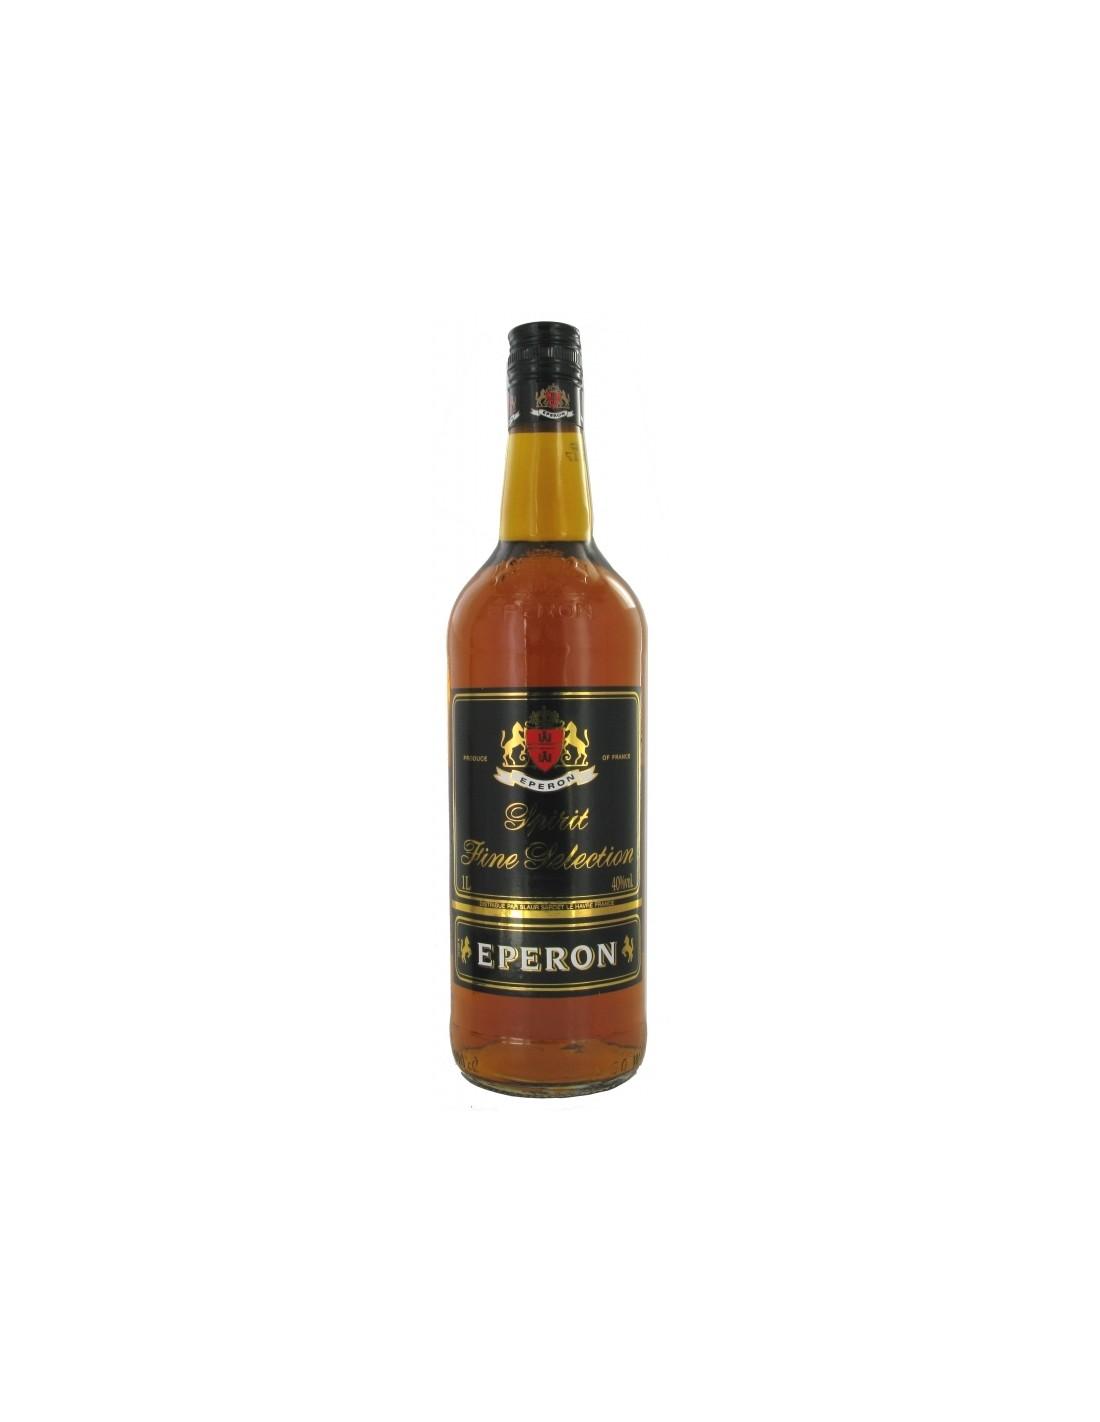 Whisky Spirit Eperon, 38% alc., 0.7L